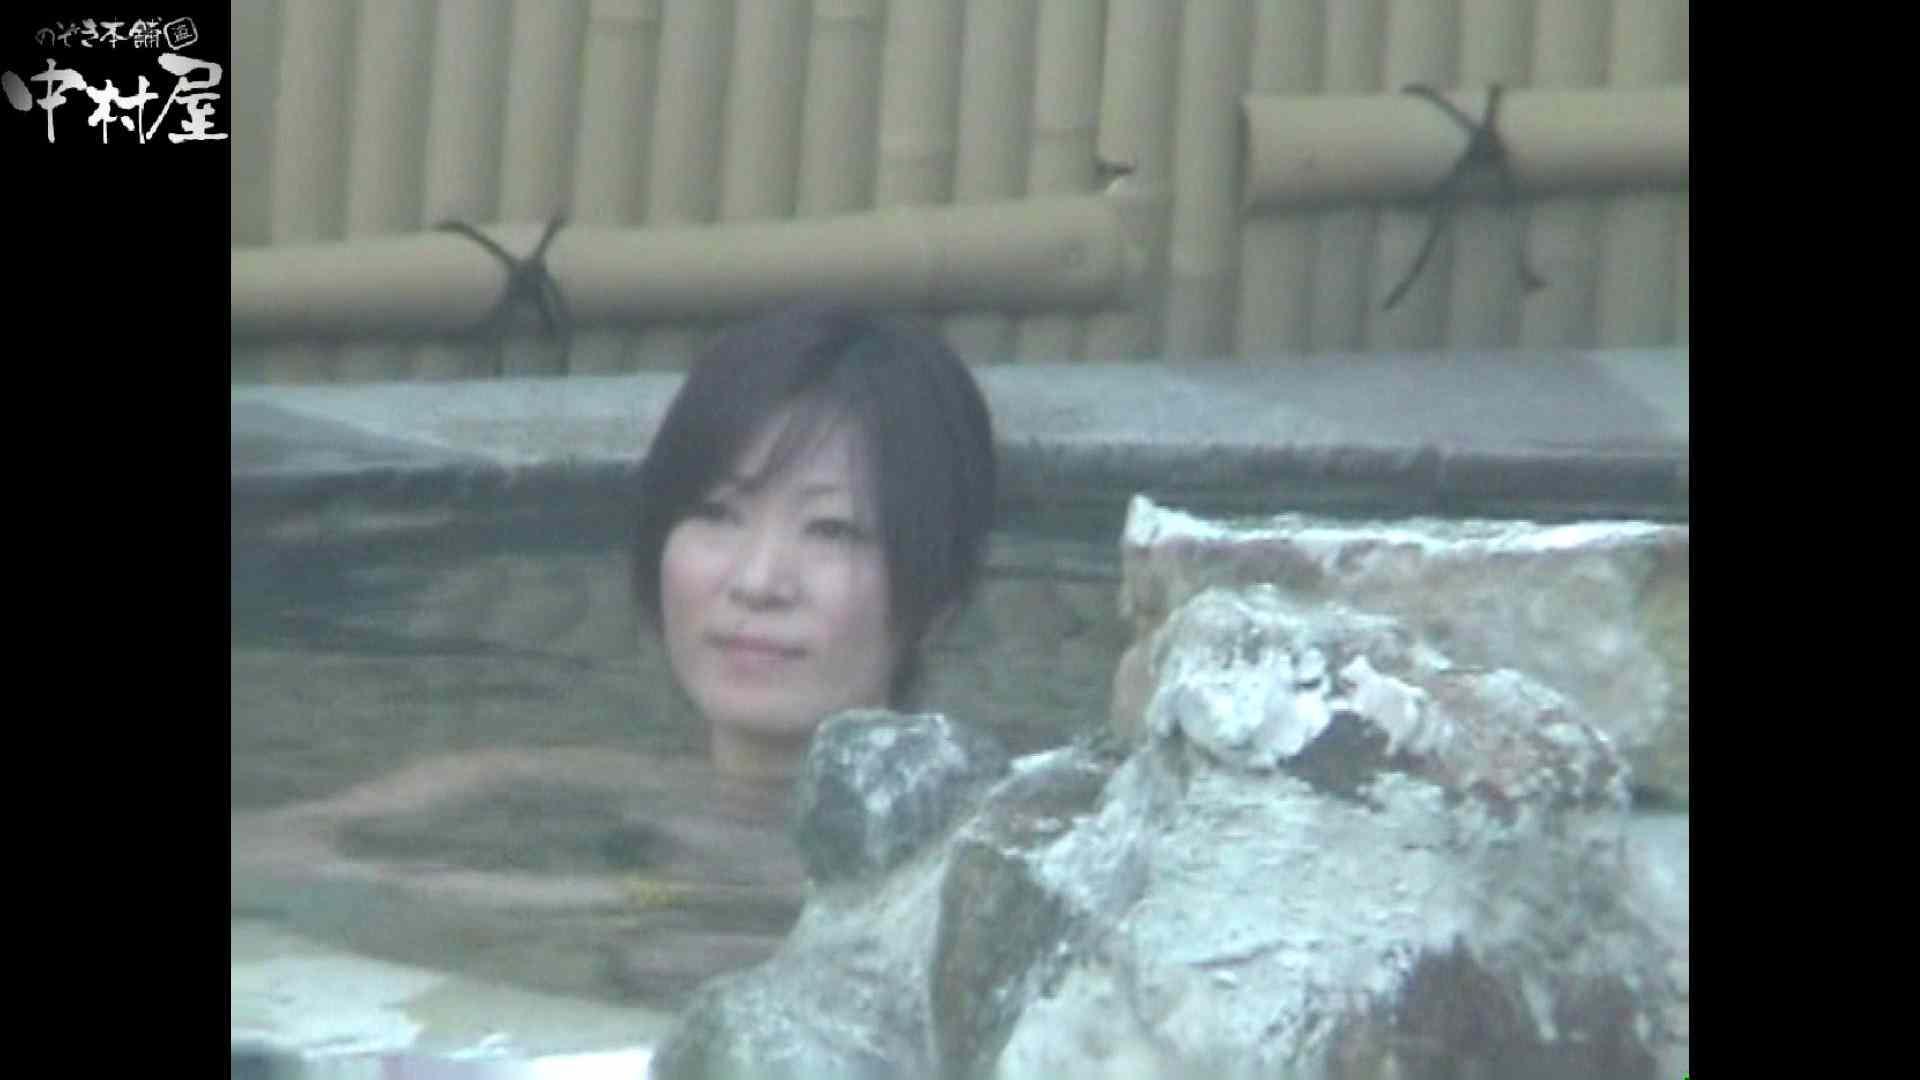 Aquaな露天風呂Vol.972 0  77連発 4